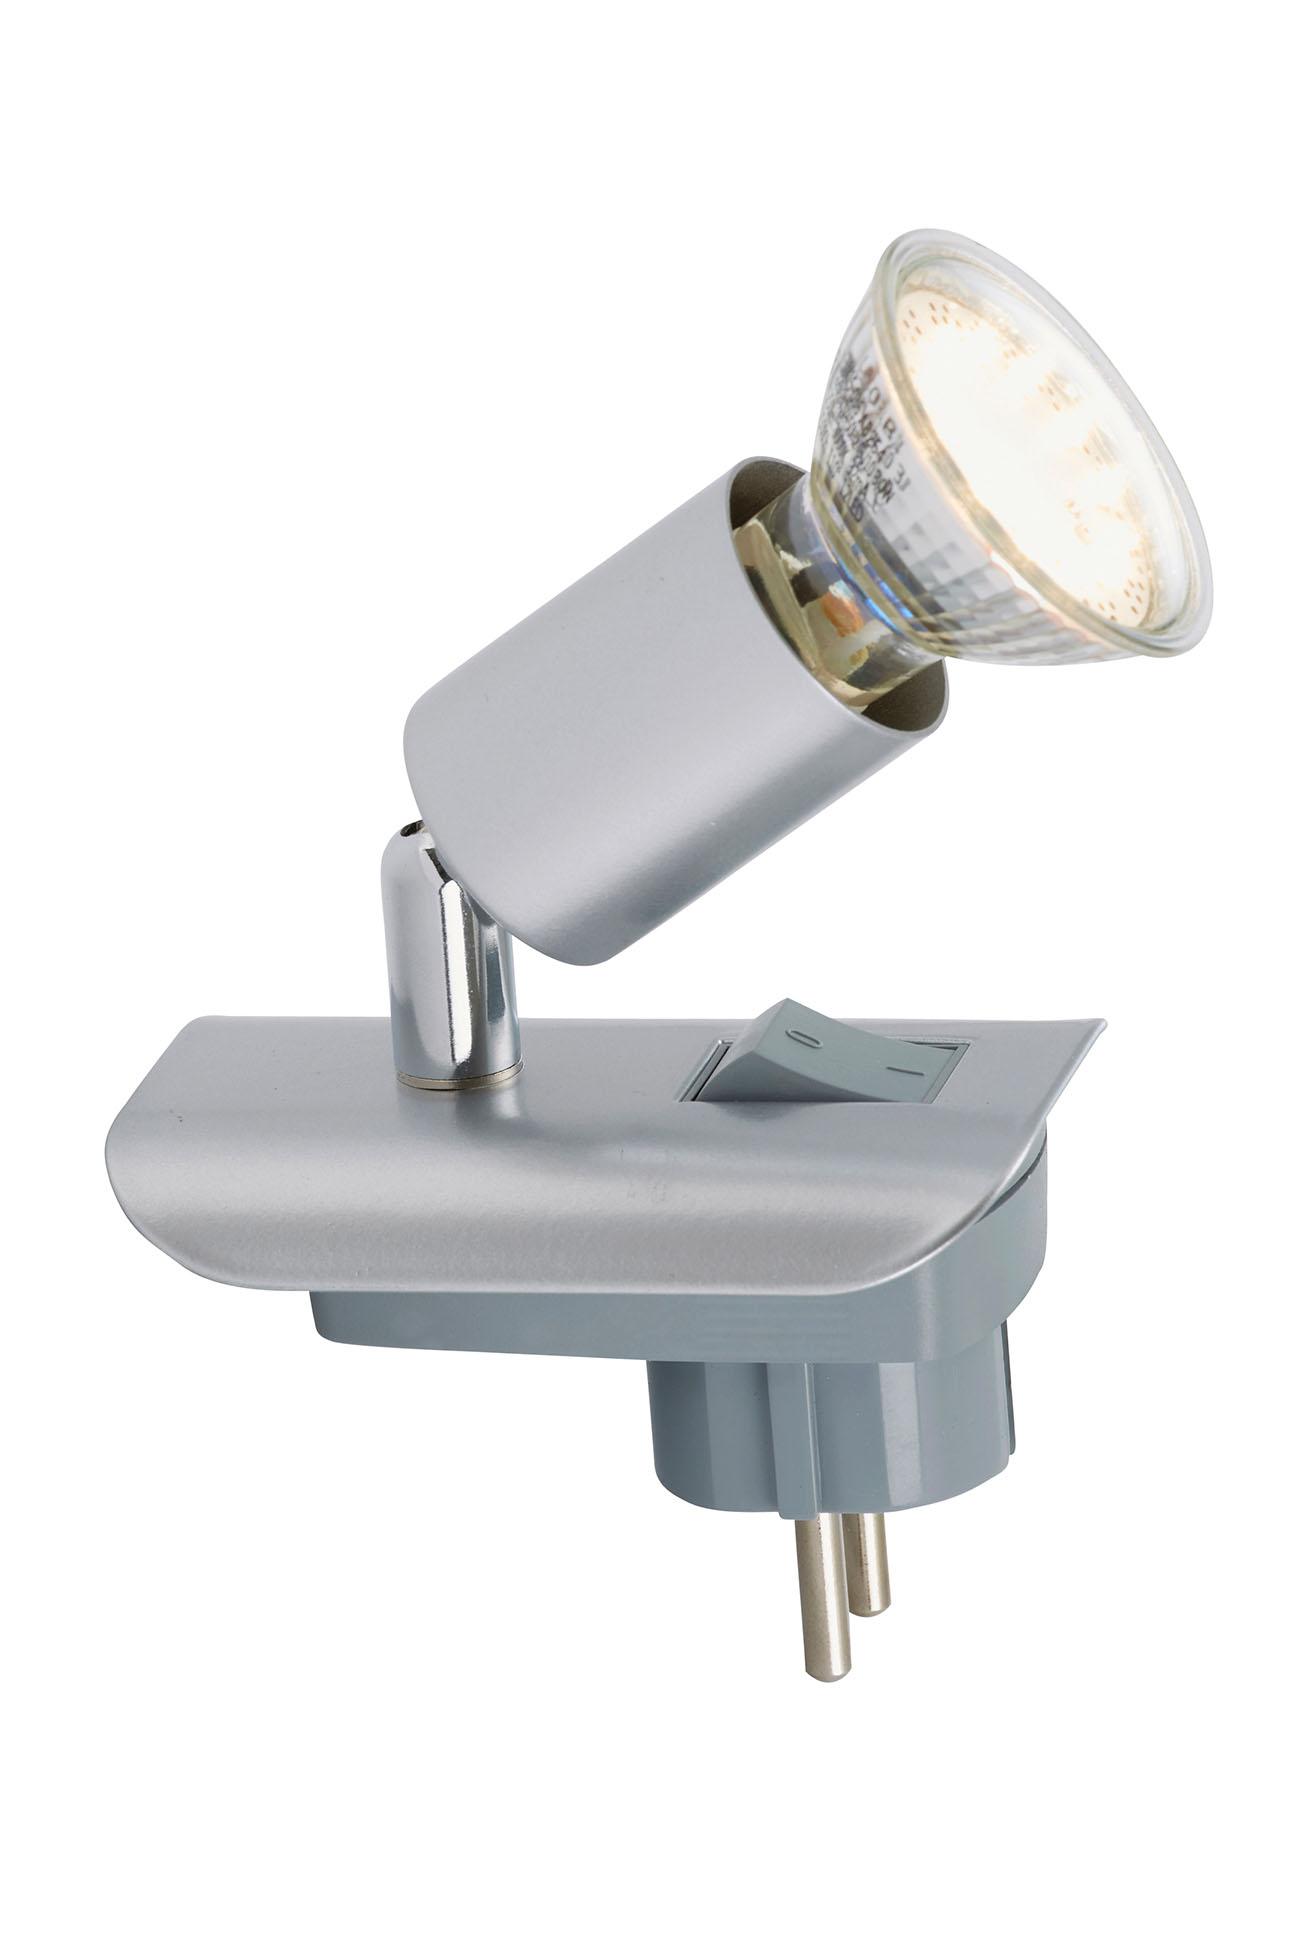 LED Steckerleuchte, 10 cm, 3 W, Silber